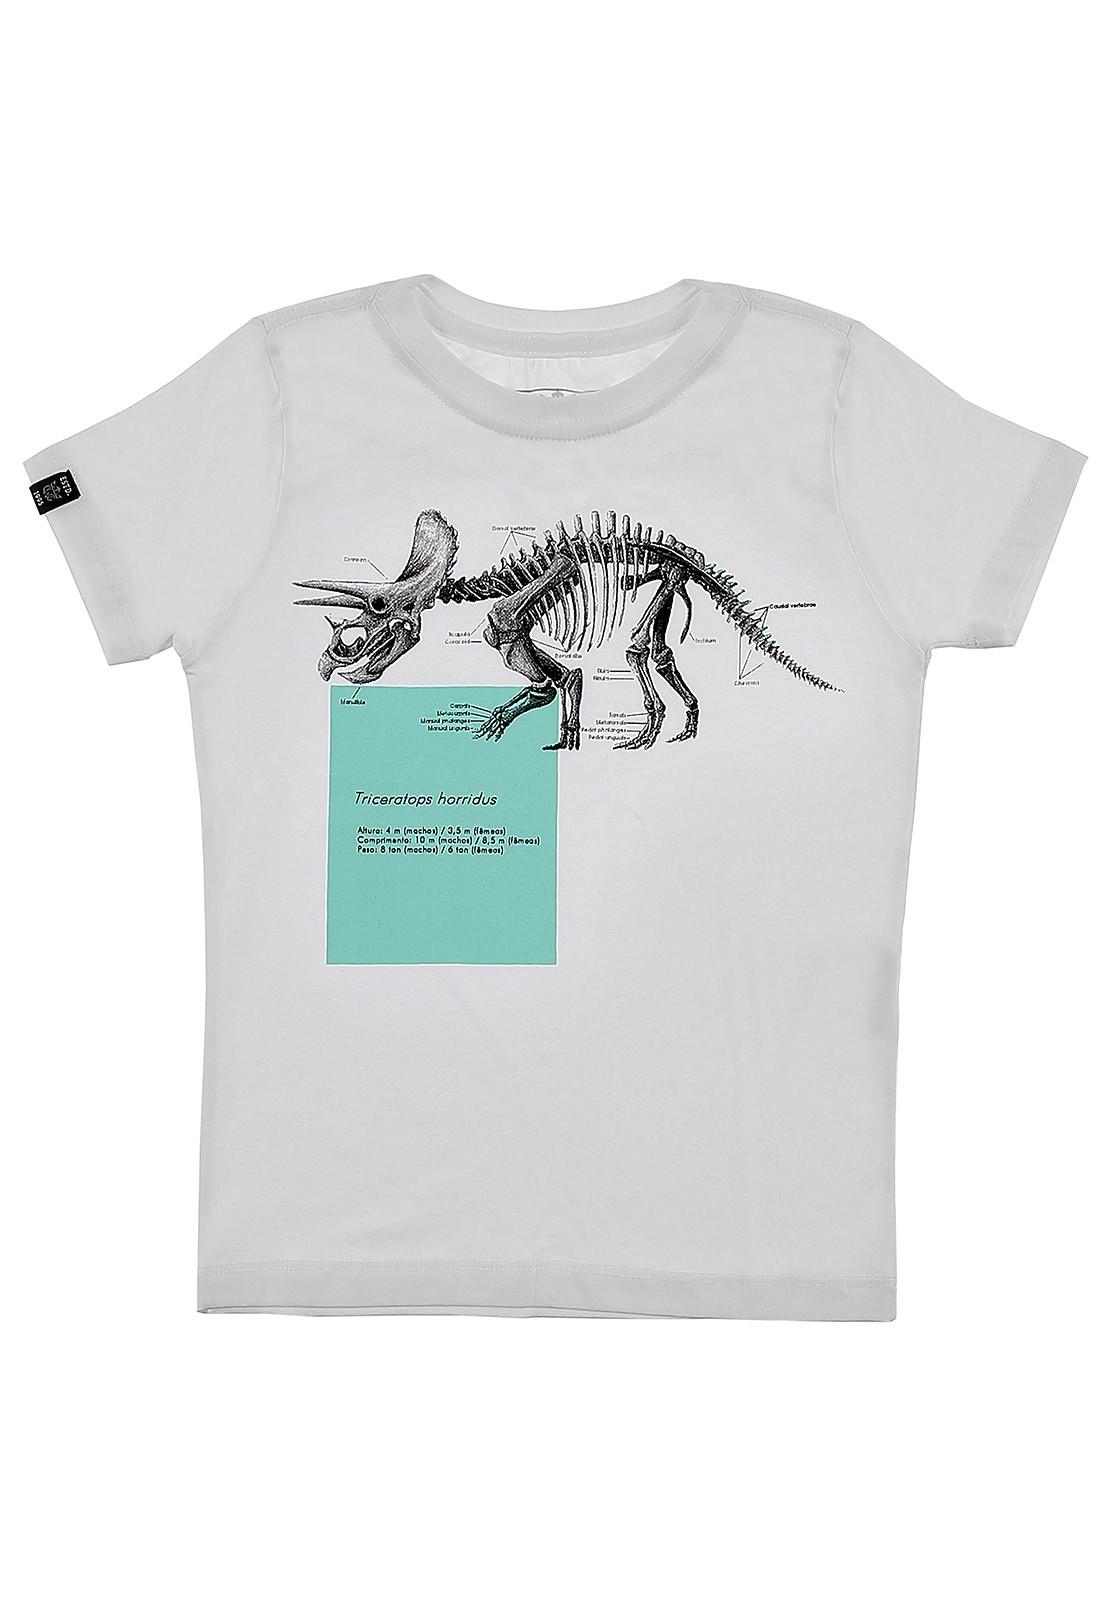 Camiseta Crawling Masculilna Manga Curta.